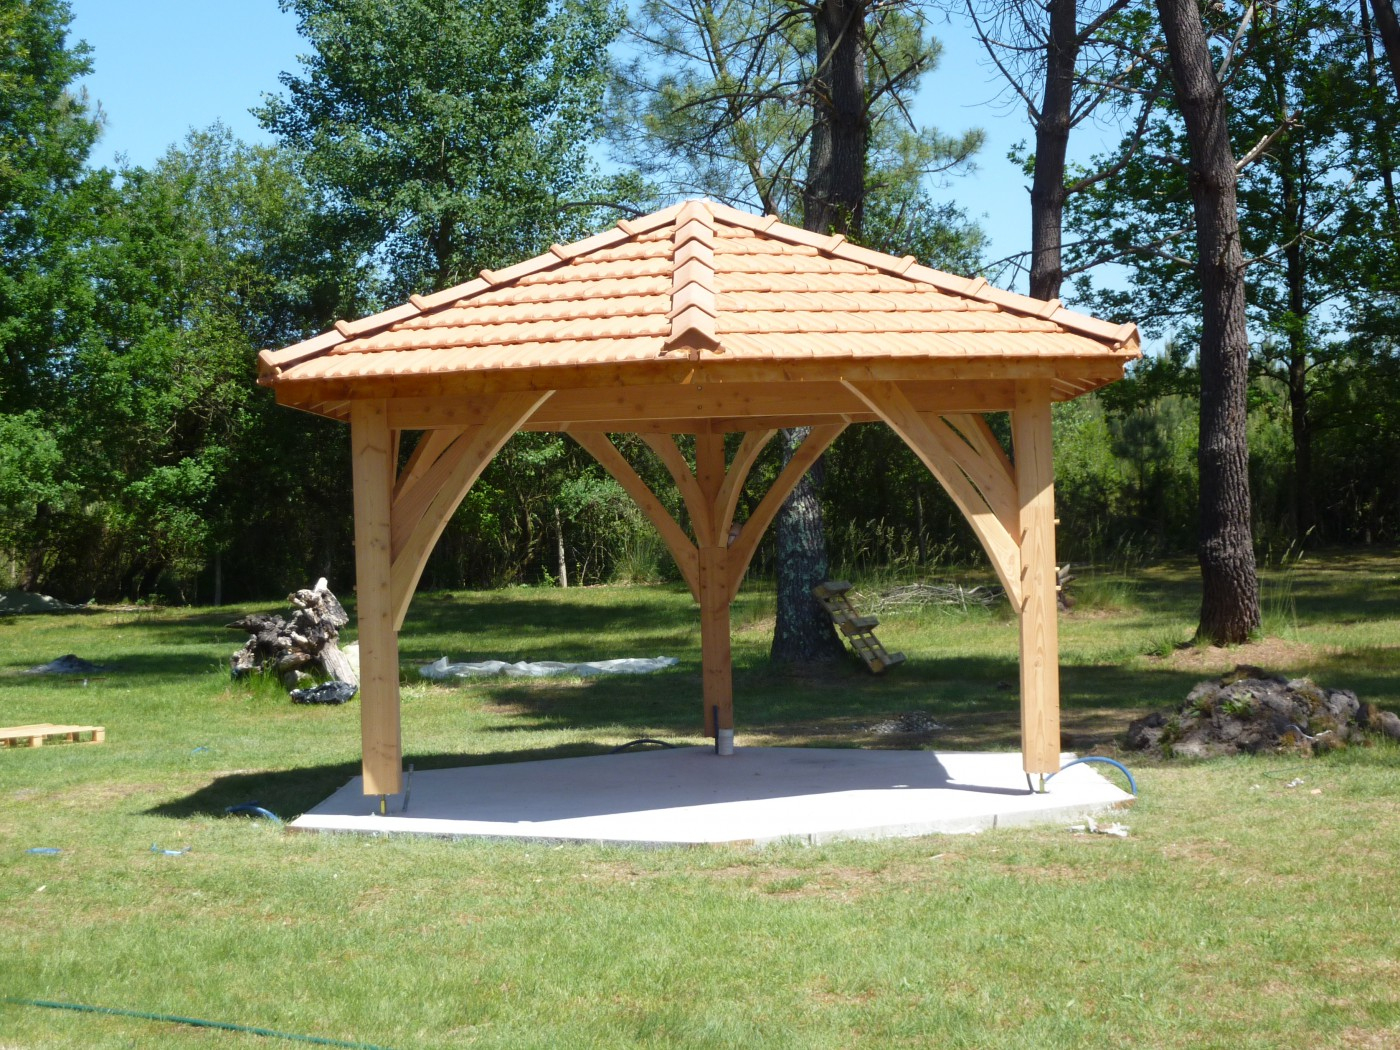 Kiosque De Jardin - Agulhon Charpente serapportantà Kiosque De Jardin En Bois